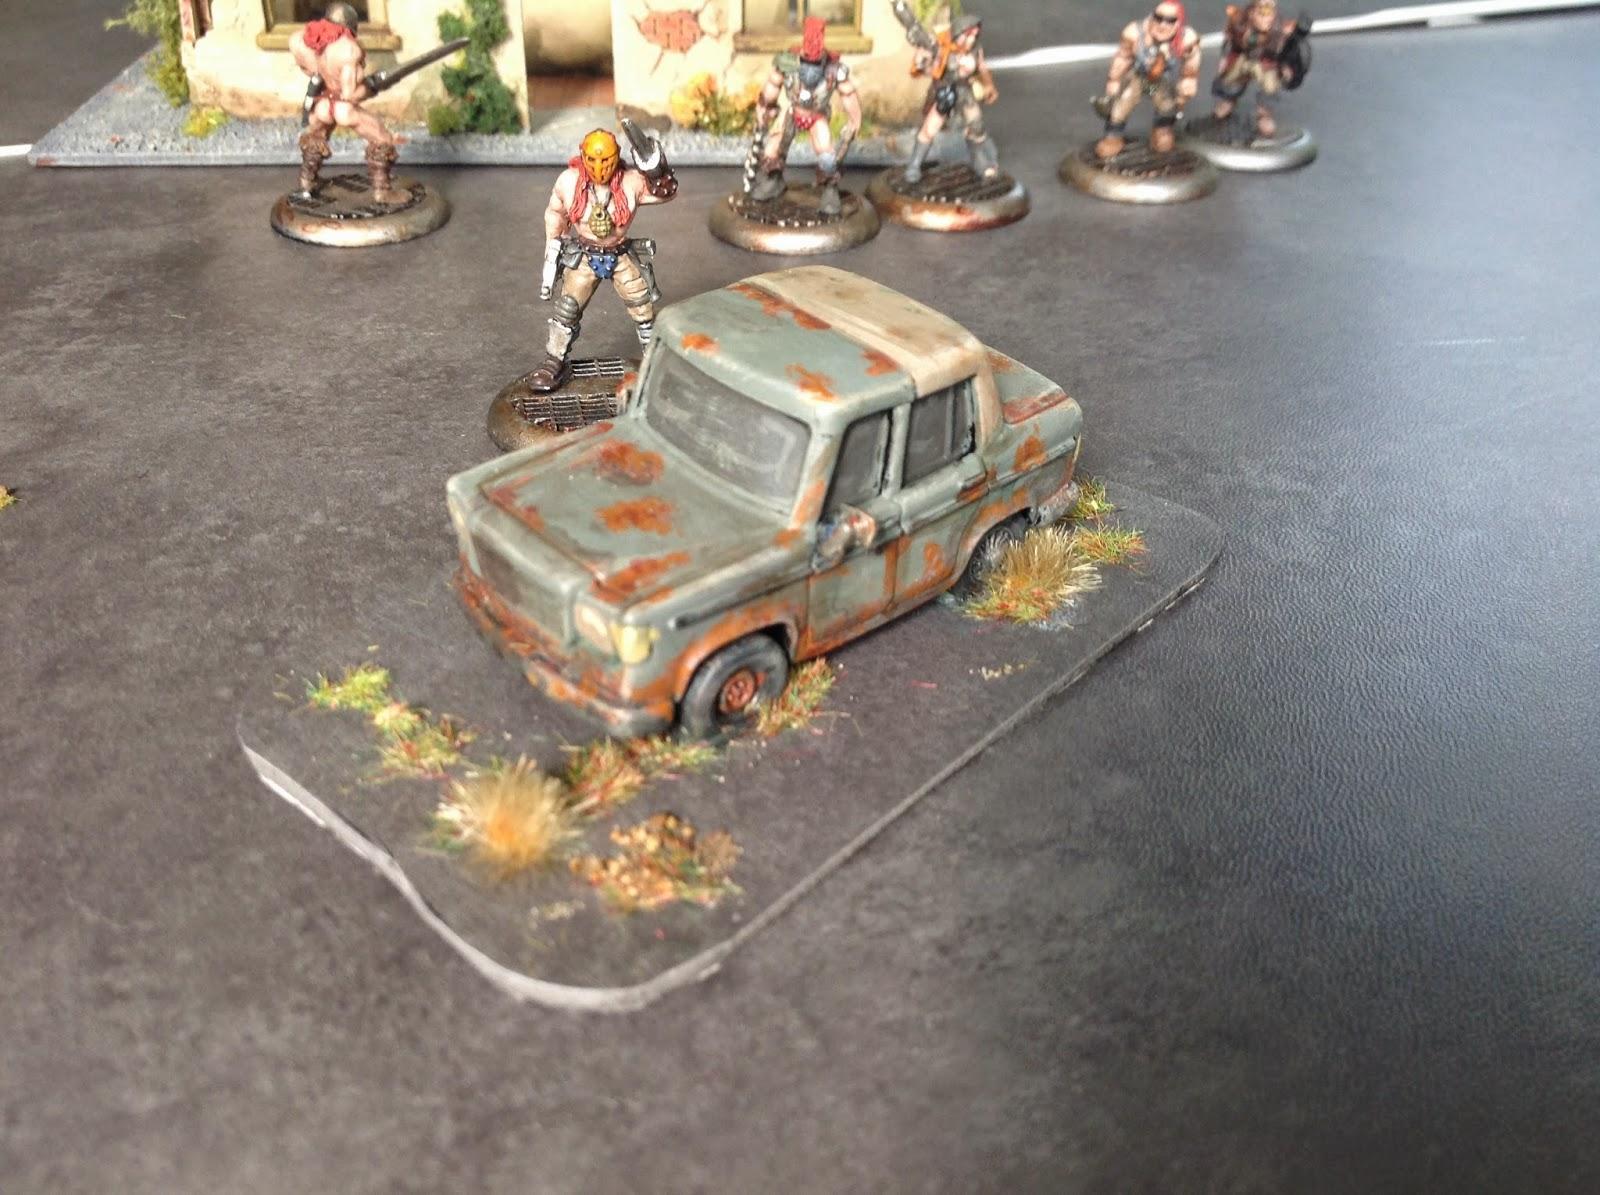 Four Colour Super Minis: AtDE: Wrecked Cars for Across The